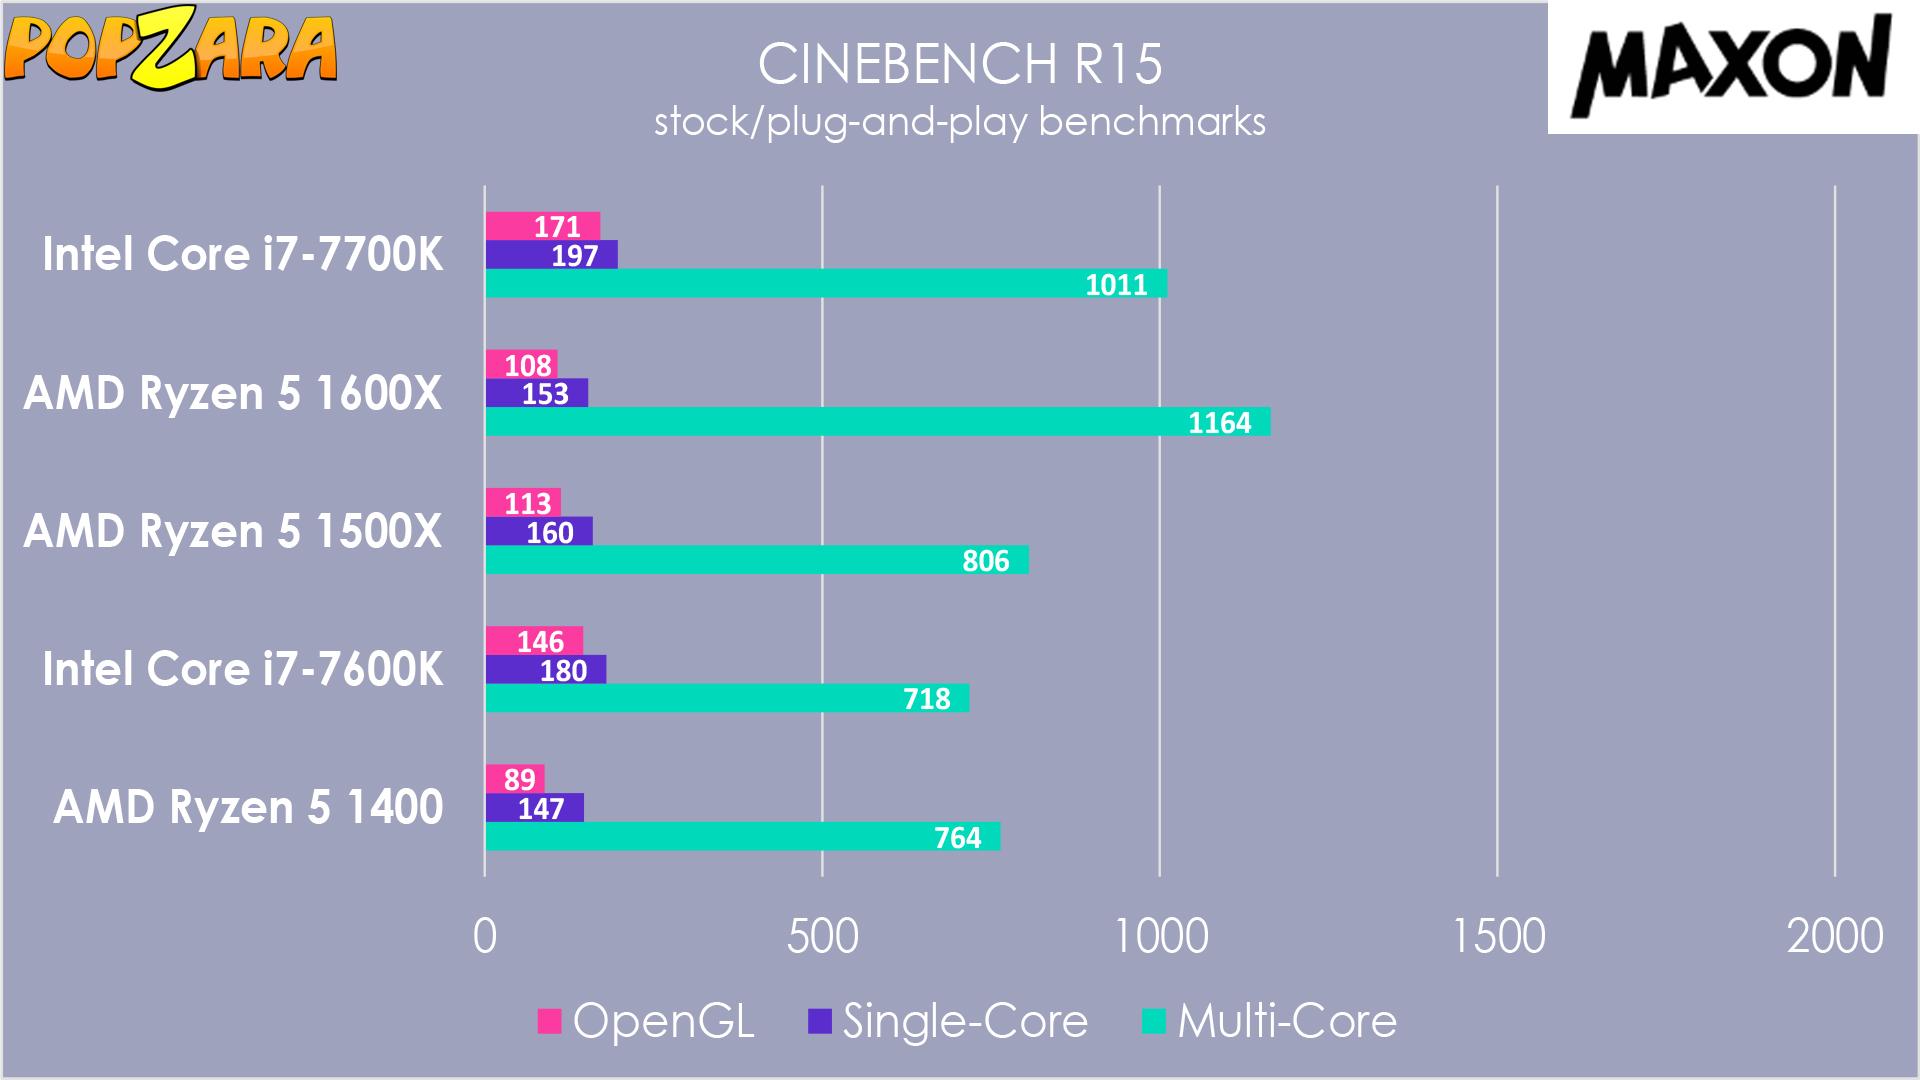 AMD Ryzen 5 1400 Desktop Processor Computer Reviews | Popzara Press